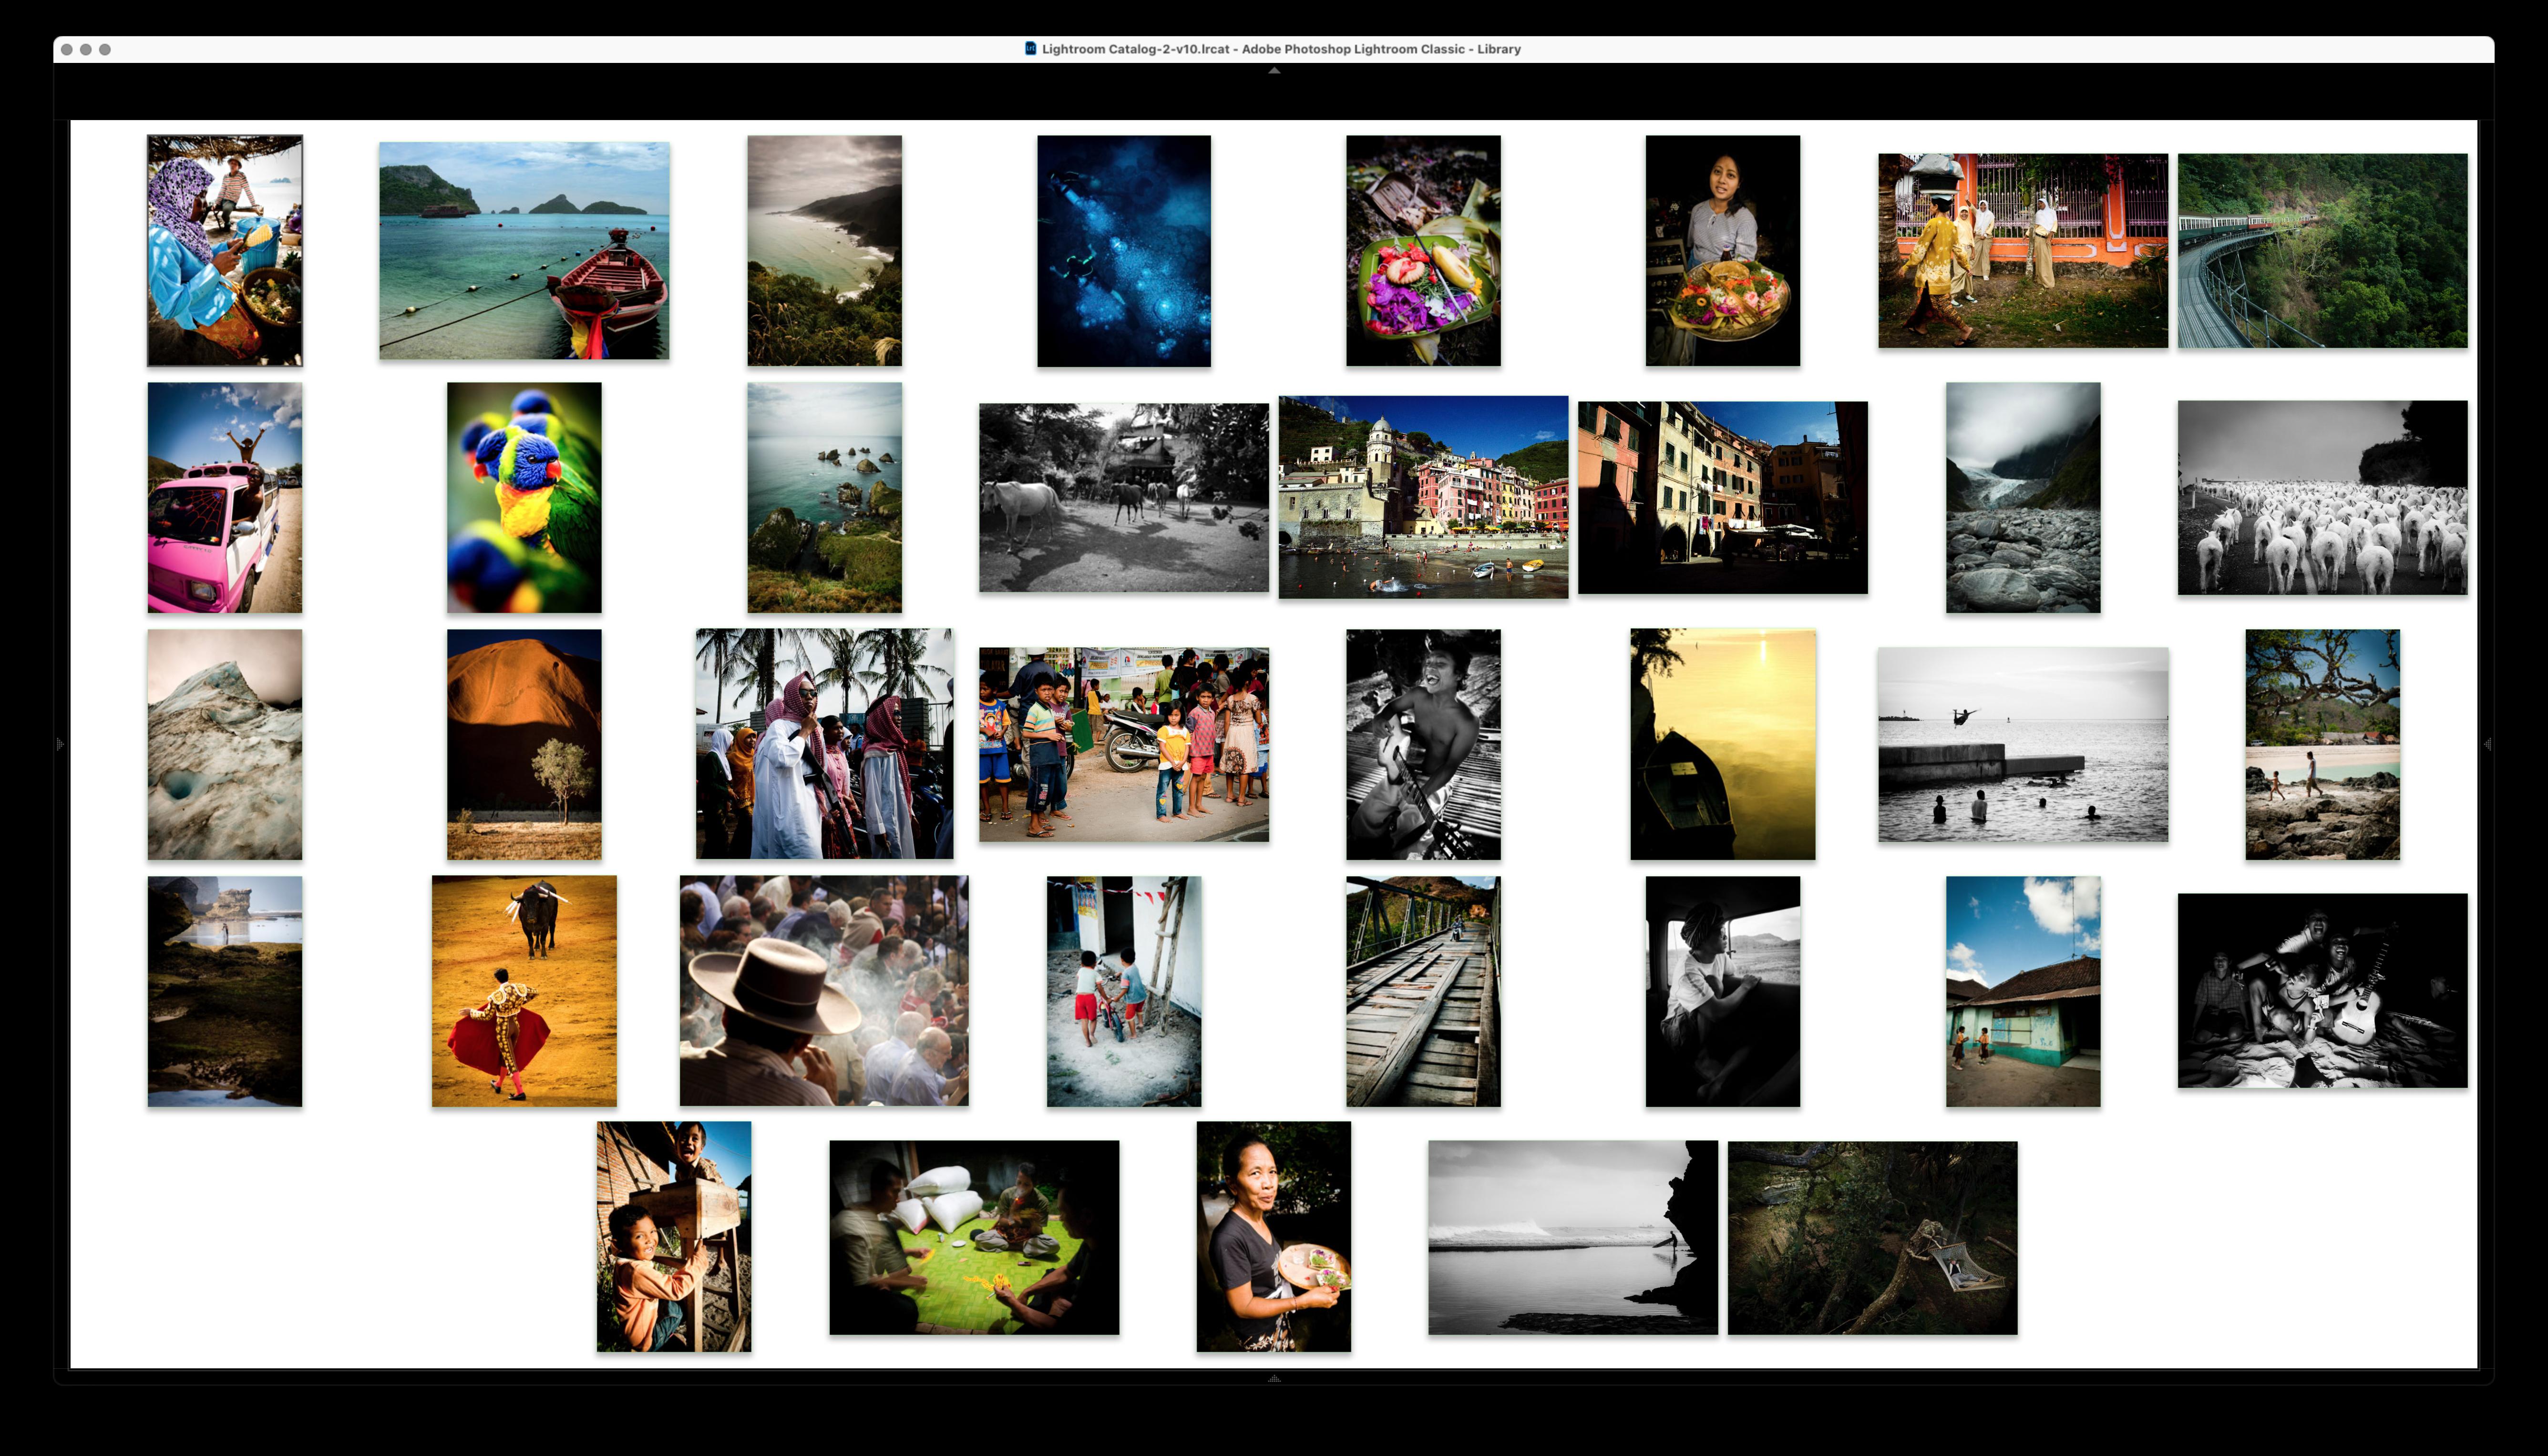 travel gallery for ryan wendlers web edit by andrew souders